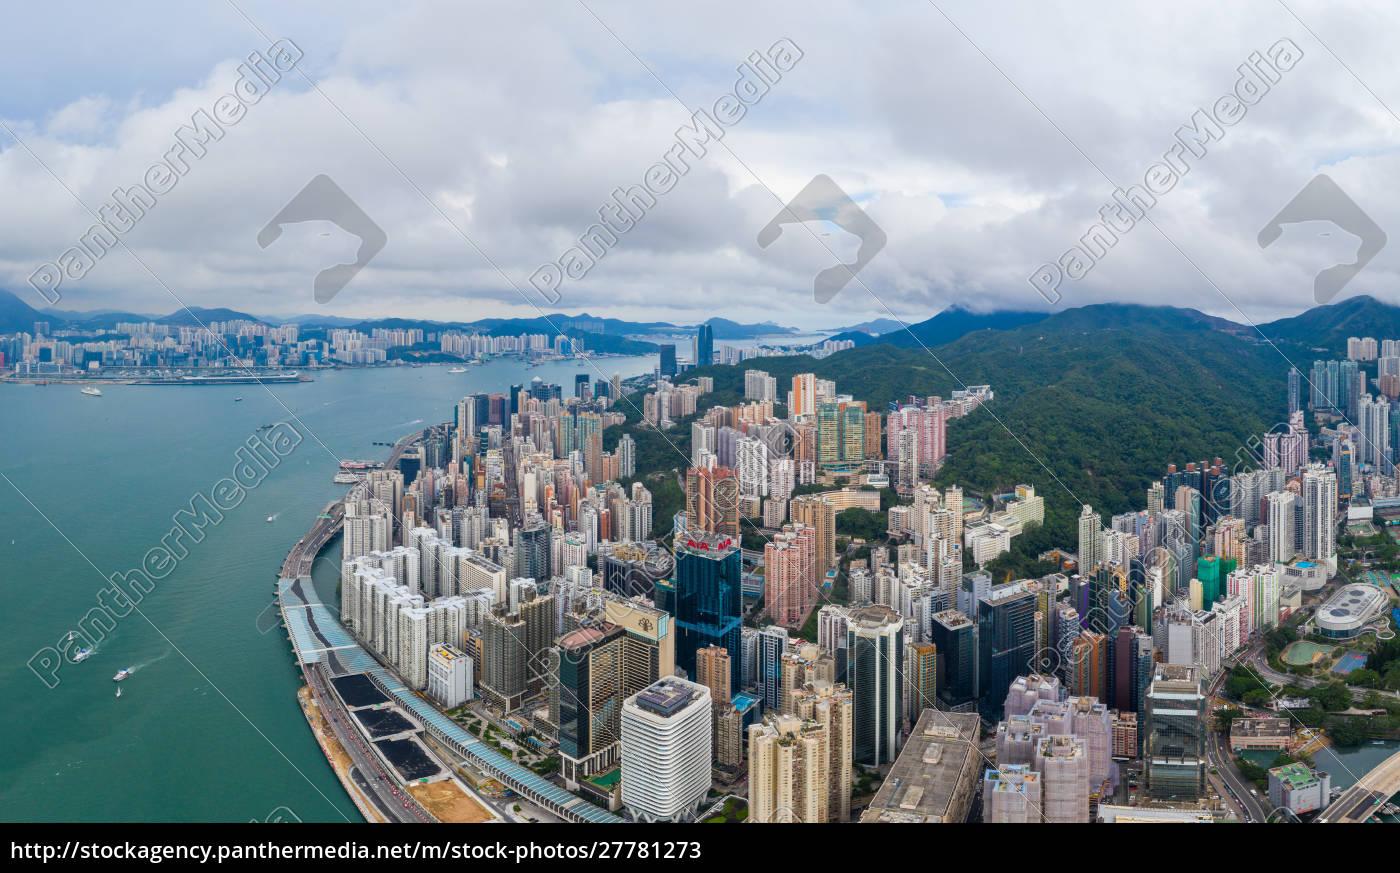 tin, hau, hongkong, 01, juni, 2019:, top-ansicht - 27781273